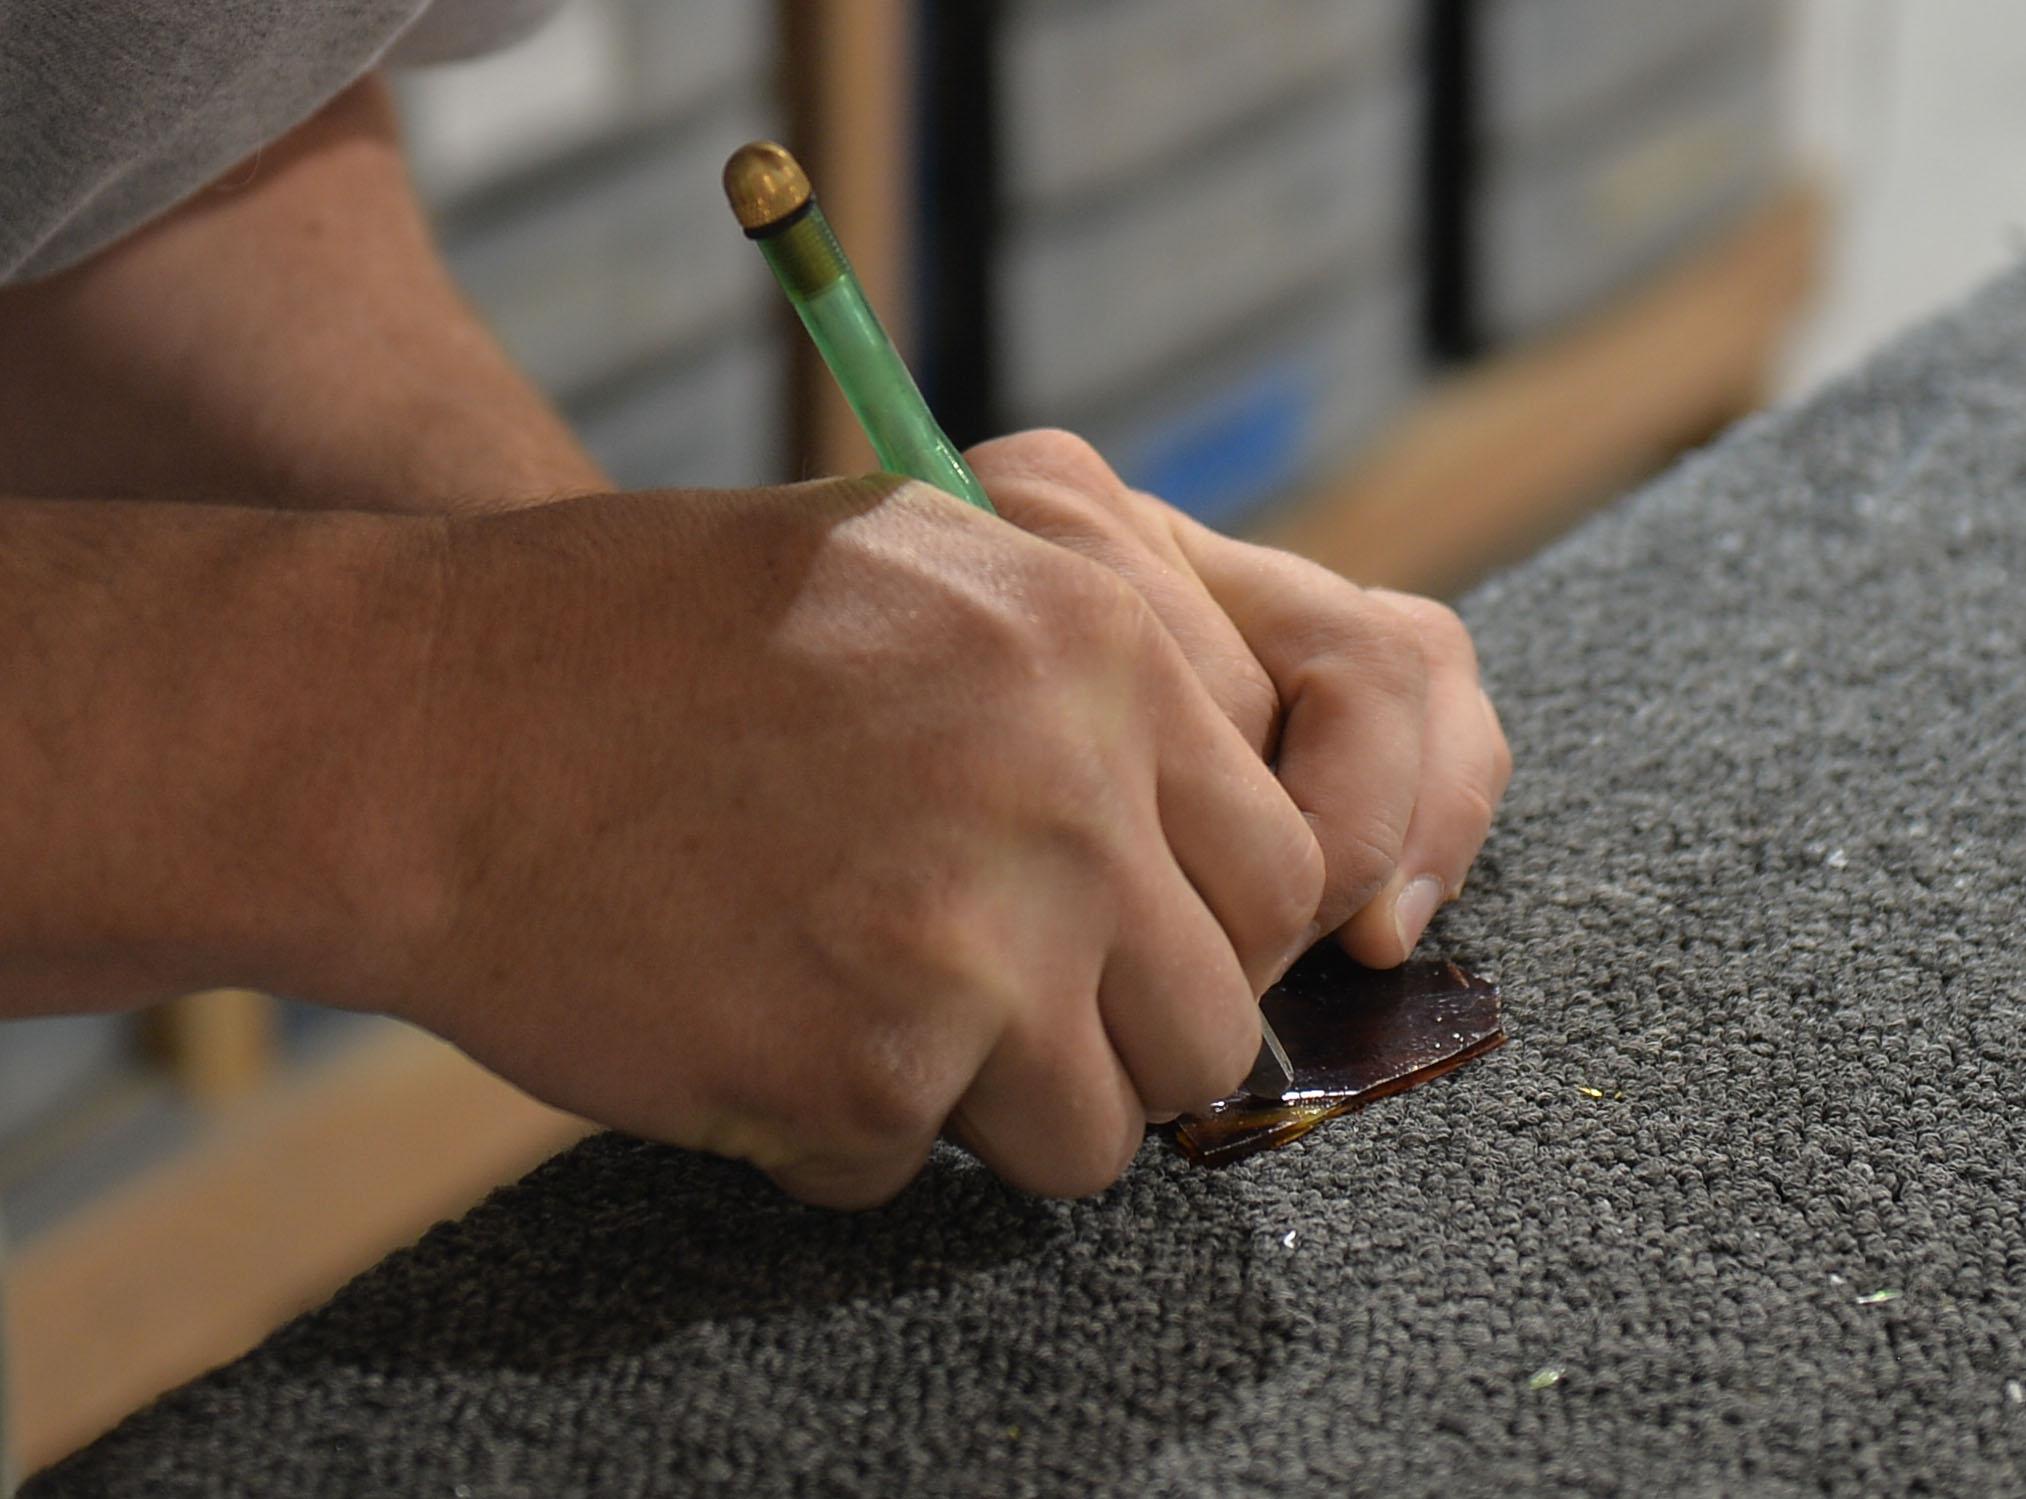 holdman-studio-stained-glass-hand-cutting.jpg